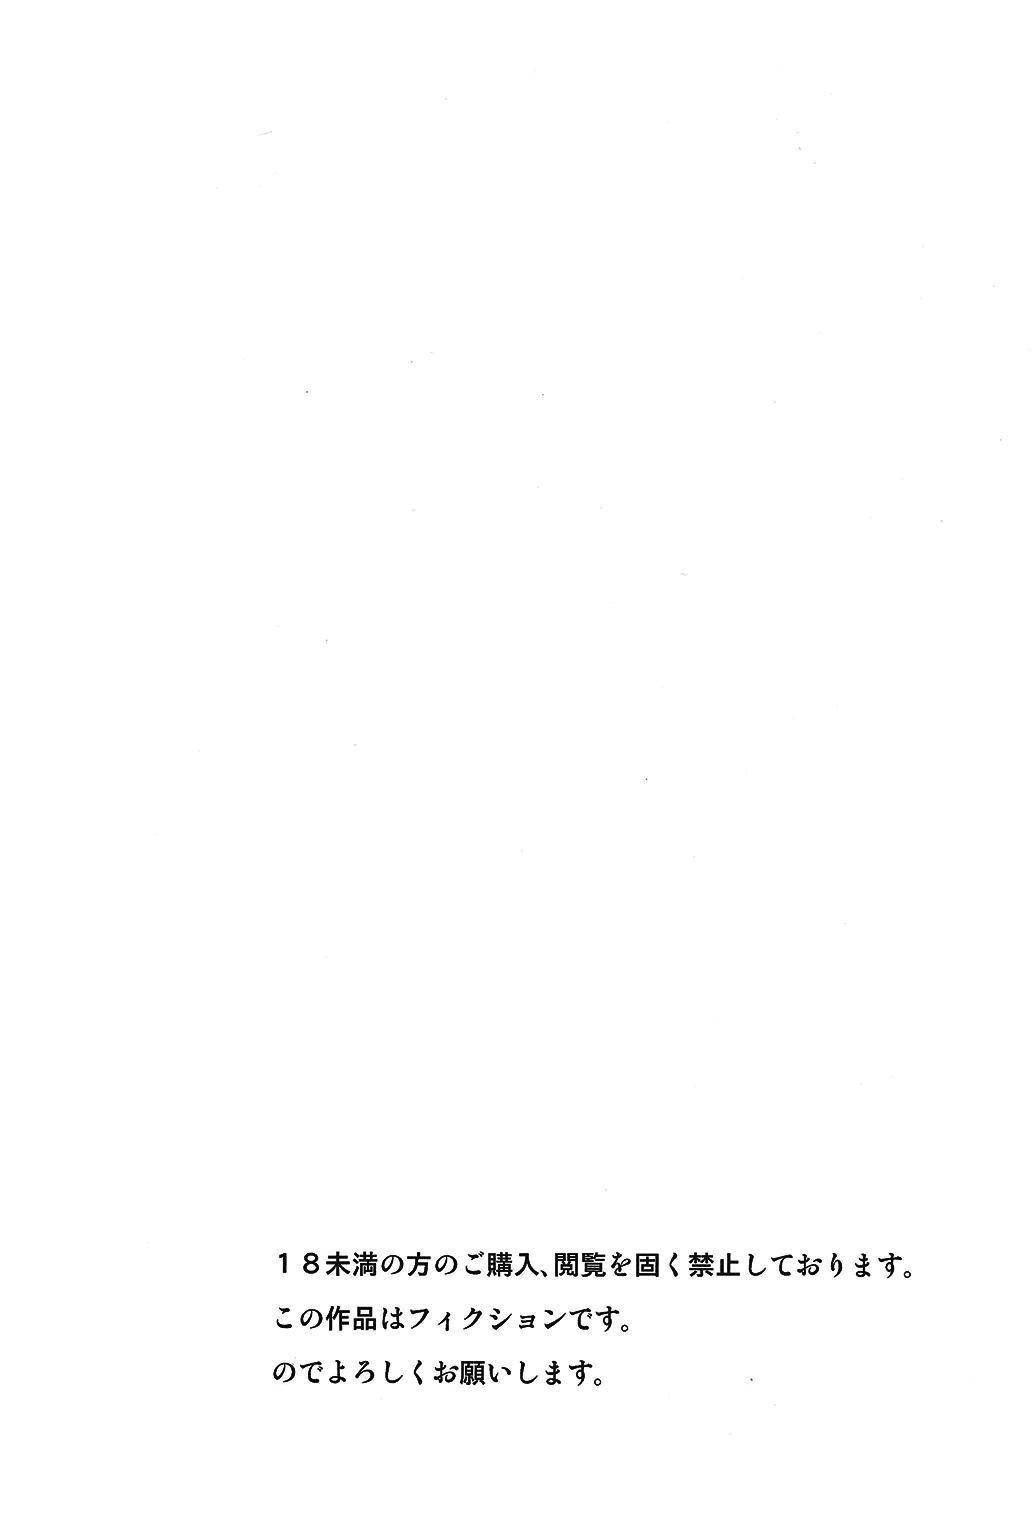 Nikuman Chokusou 2